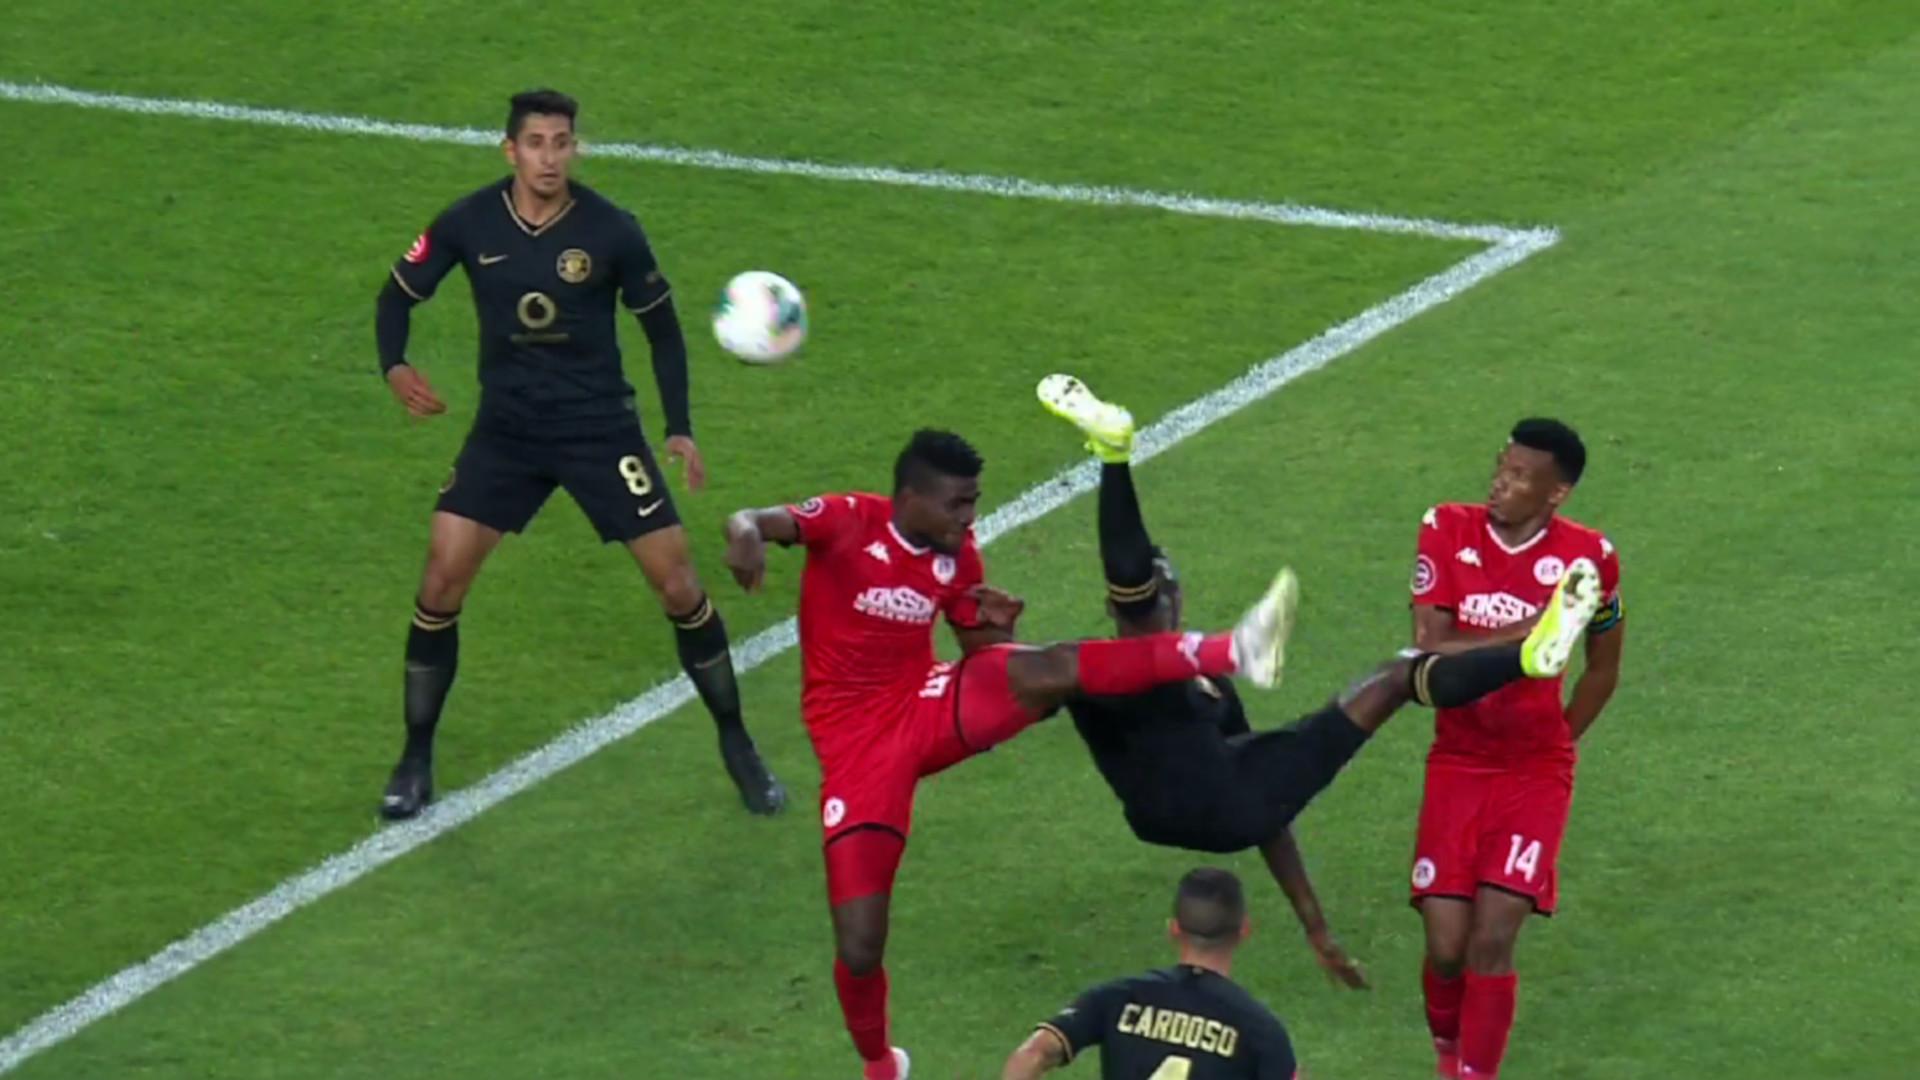 Absa Premiership 2019/20 | Kaizer Chiefs v Highlands Park | Mathoho's goal